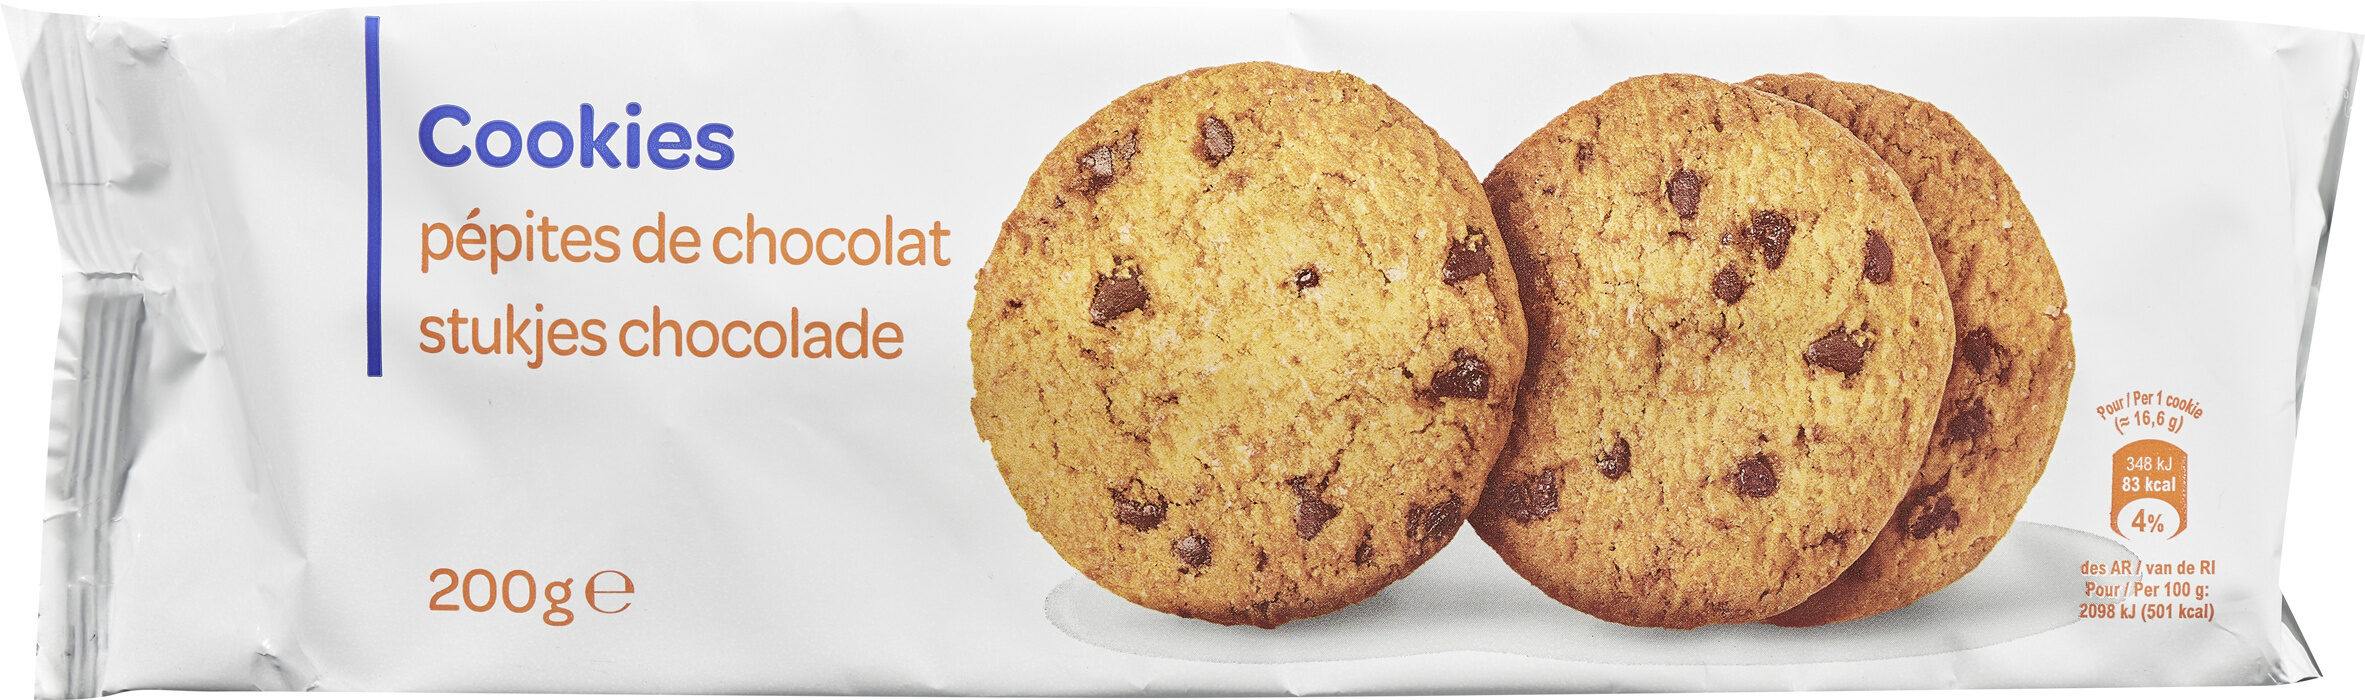 Cookies pepites de chocolat - Prodotto - fr